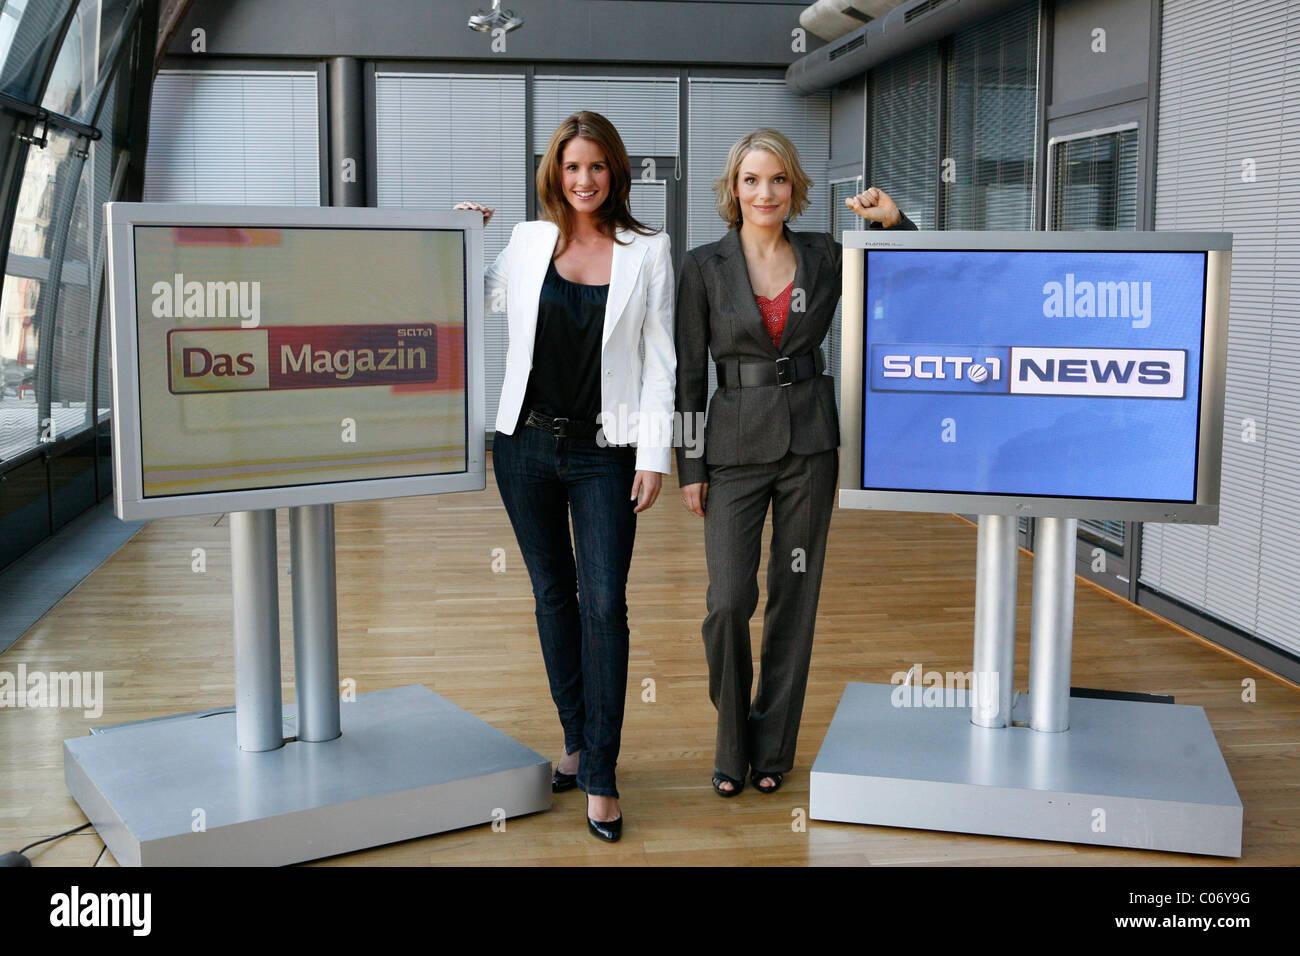 Mareile hoeppner katja losch photocall in sat 1 studios for Nachrichten magazin